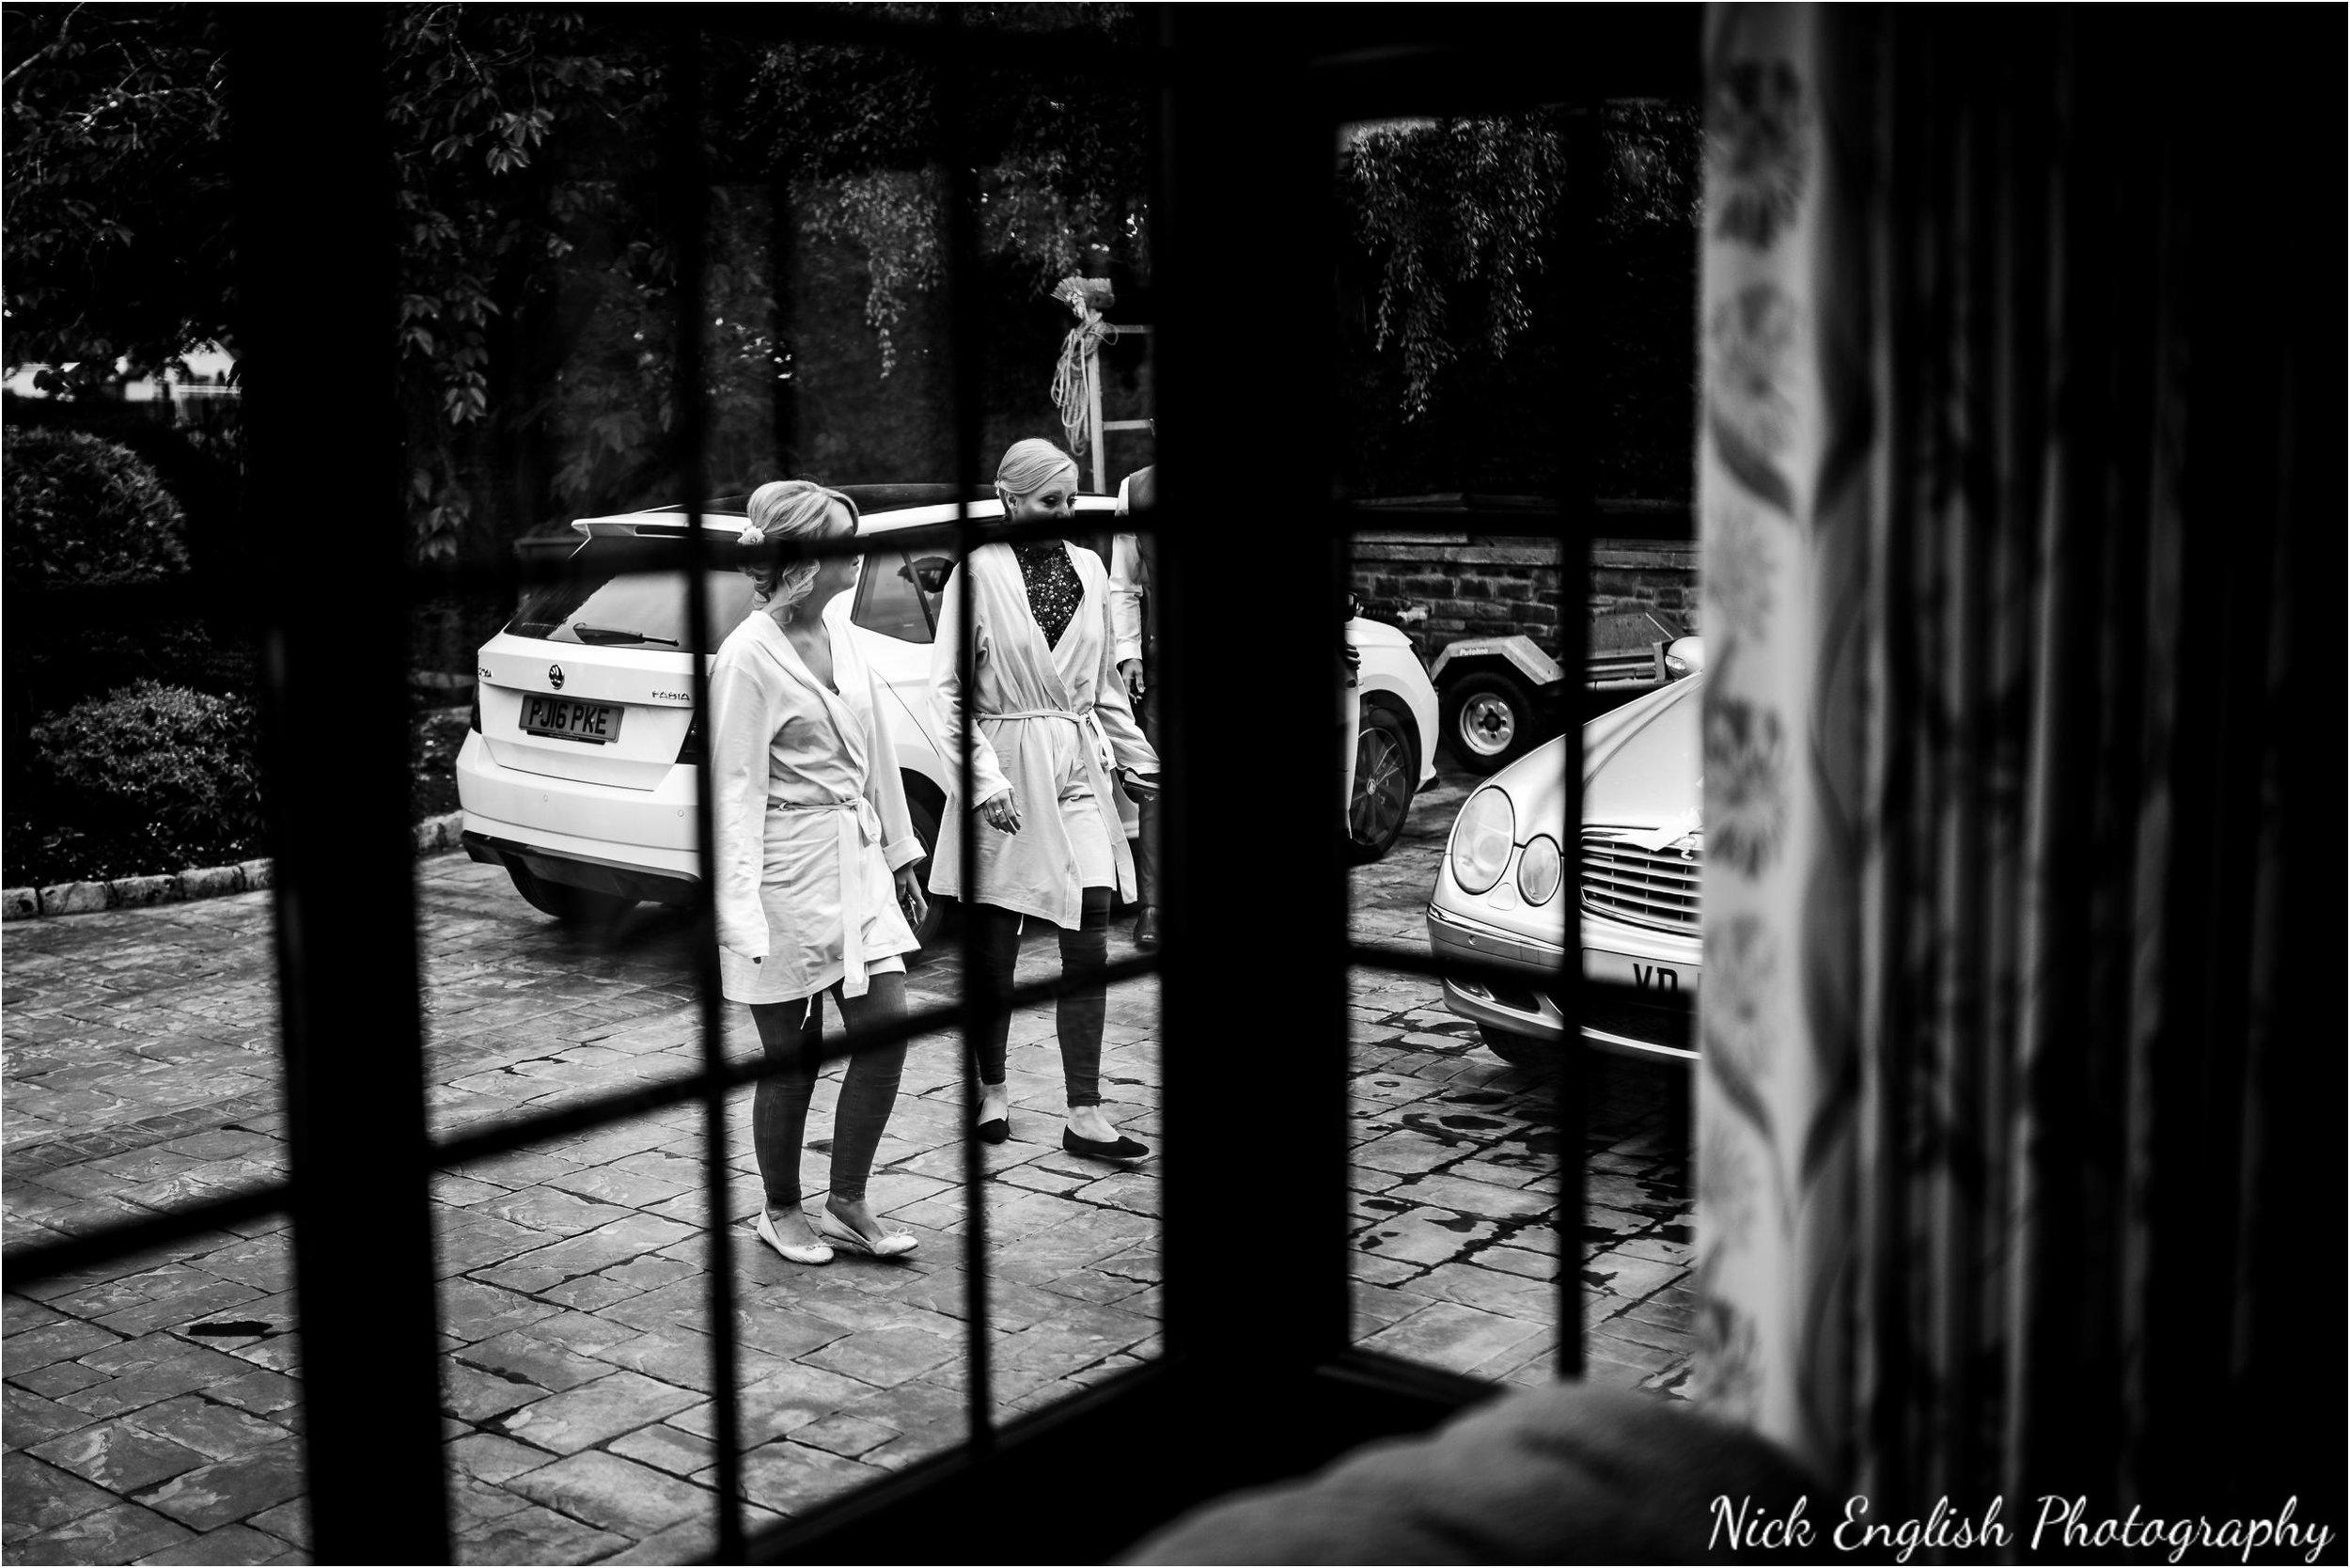 Emily David Wedding Photographs at Barton Grange Preston by Nick English Photography 23jpg.jpeg